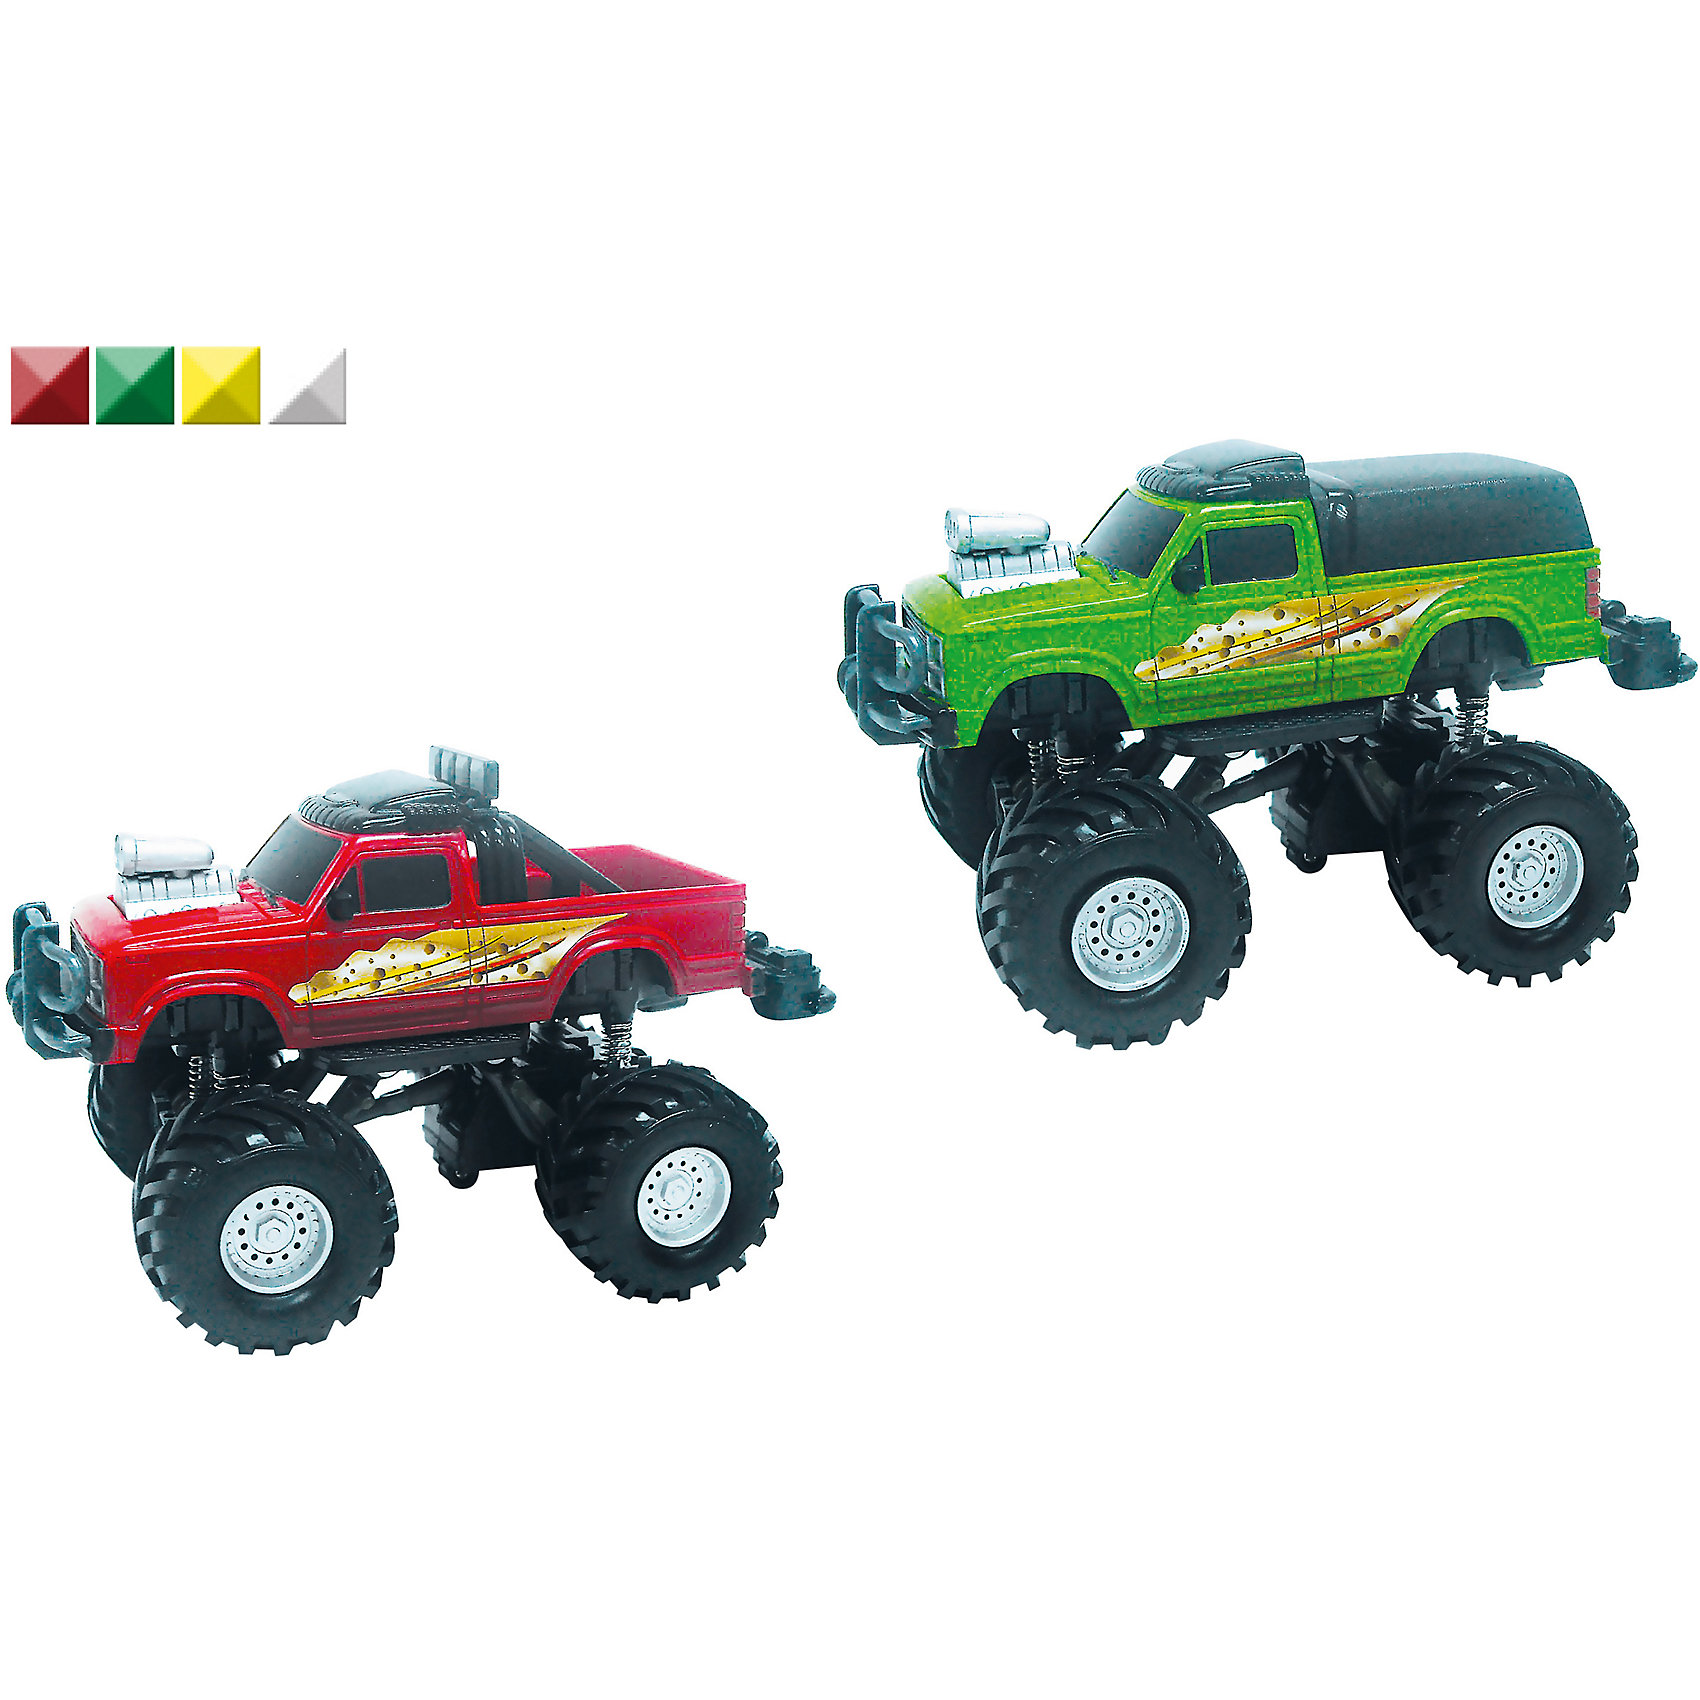 Машина Monster Truck, 1:32, со звуком, AutotimeМашинки<br><br><br>Ширина мм: 350<br>Глубина мм: 120<br>Высота мм: 158<br>Вес г: 288<br>Возраст от месяцев: 36<br>Возраст до месяцев: 2147483647<br>Пол: Мужской<br>Возраст: Детский<br>SKU: 5583853